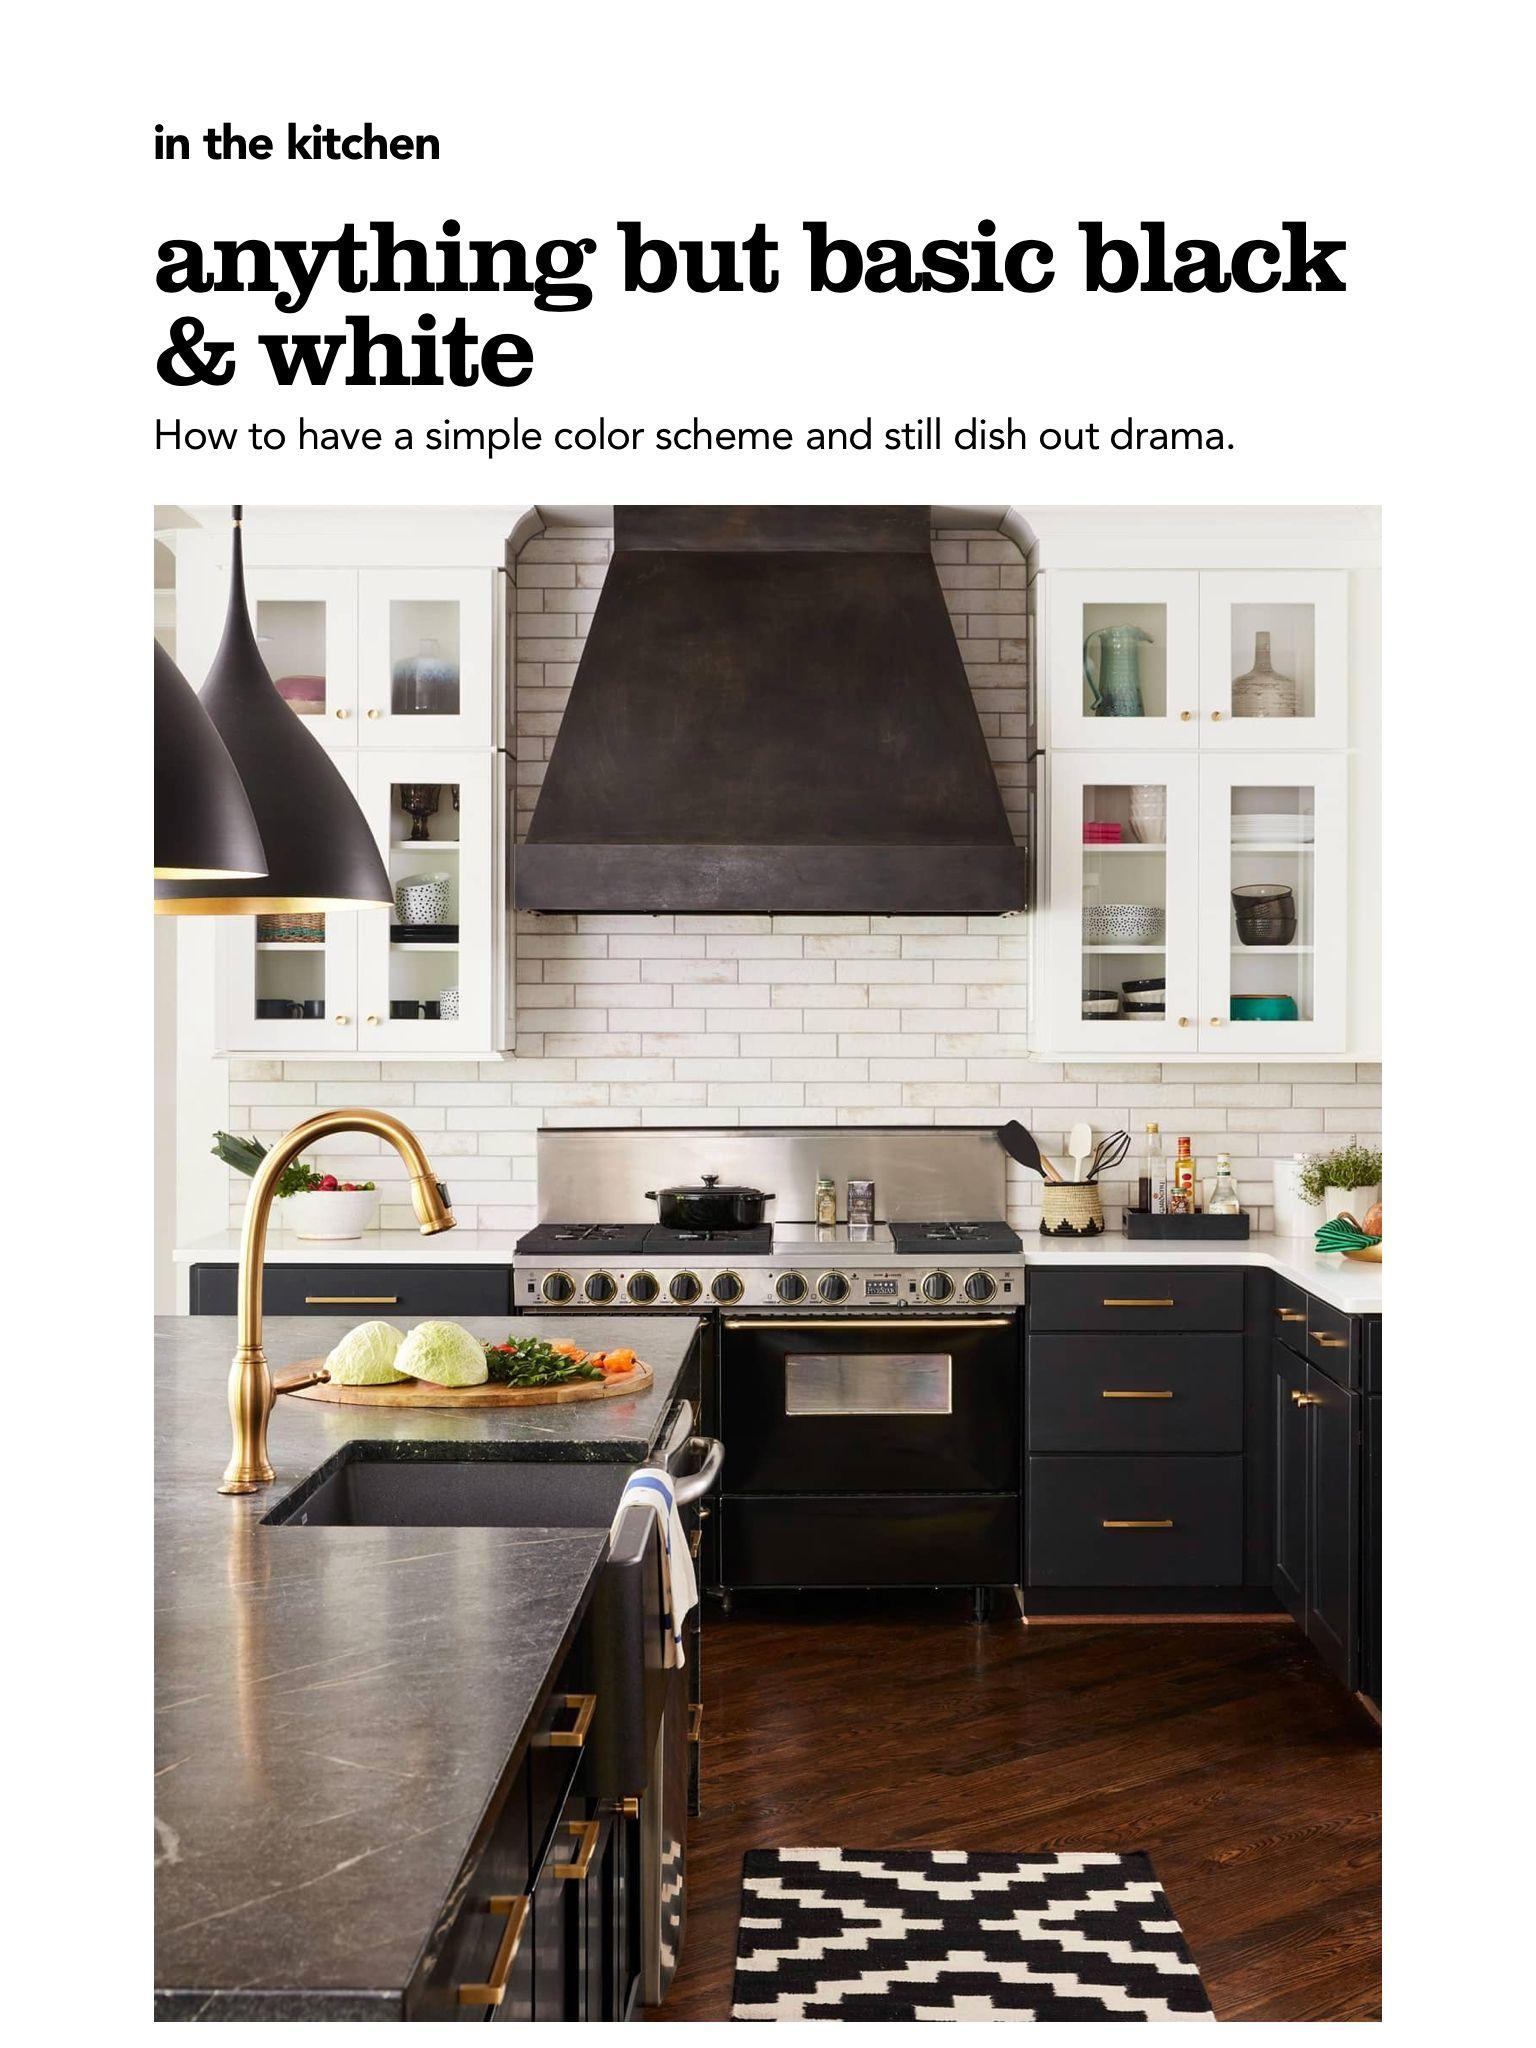 Anything But Basic Black White From Hgtv Magazine May 2018